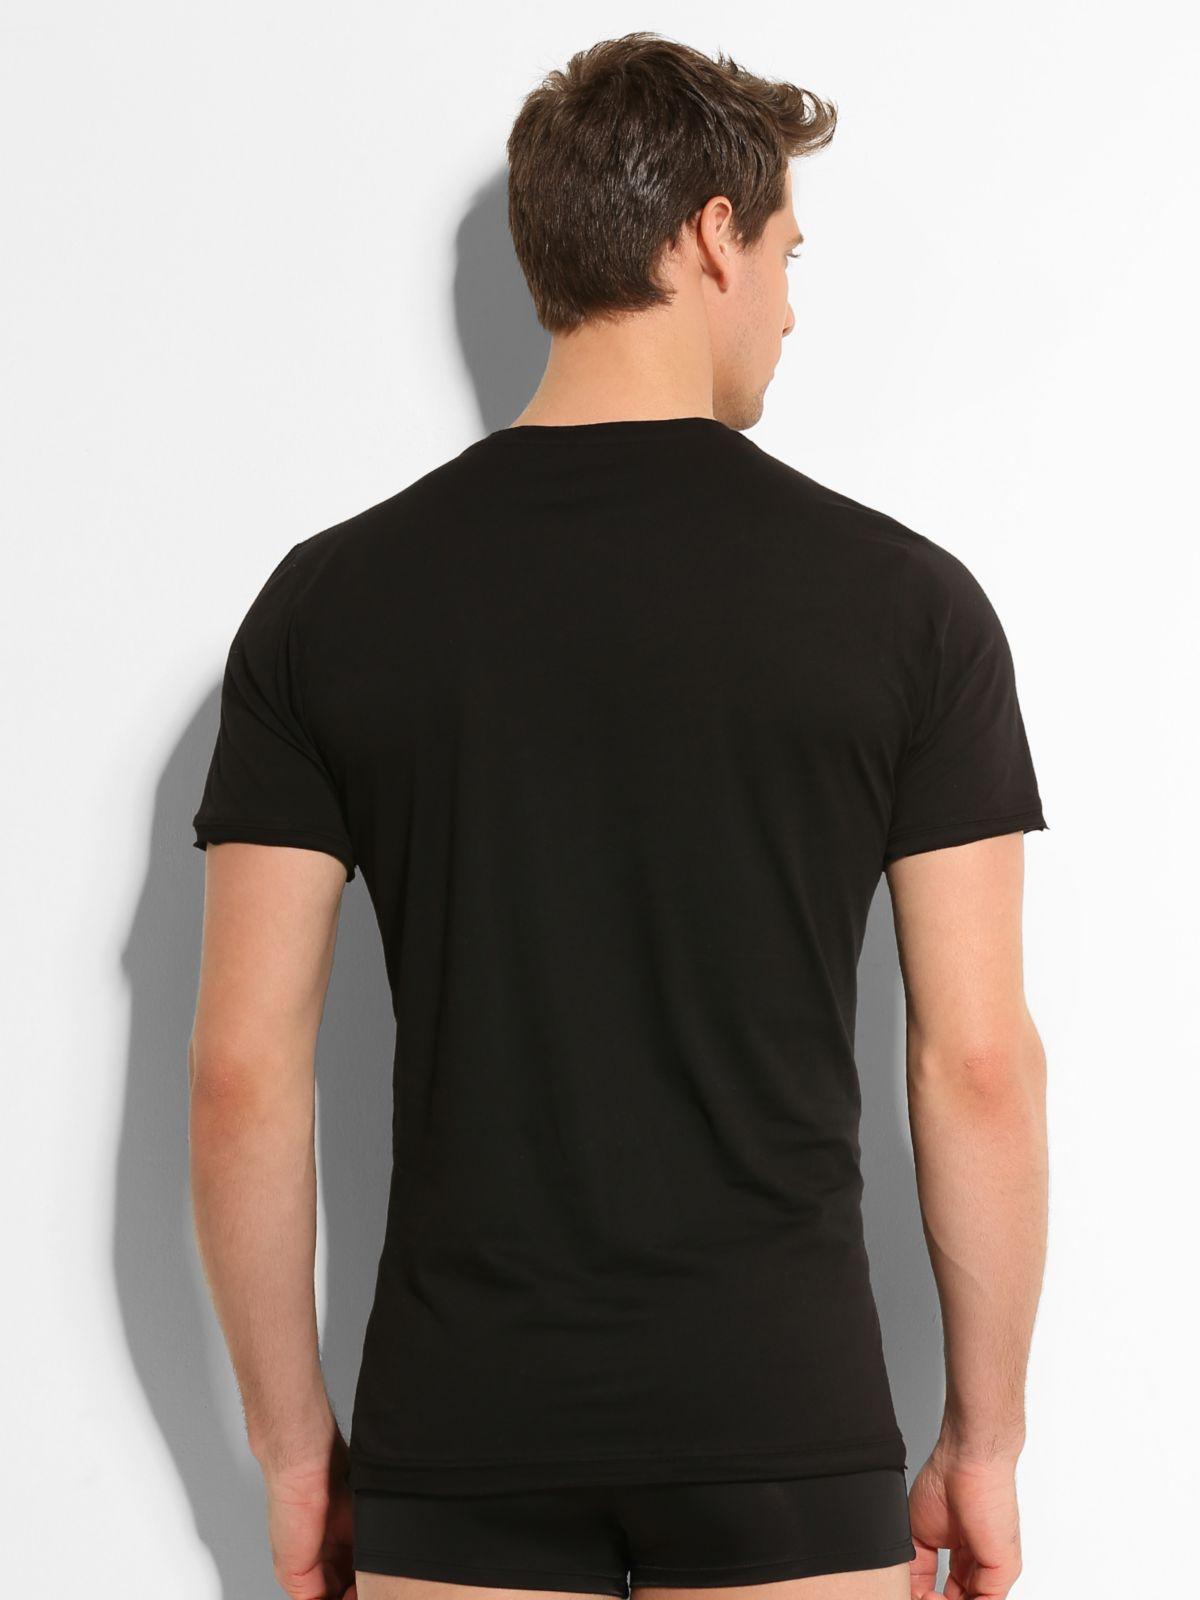 Guess back to la t shirt in black for men lyst for Black t shirt back